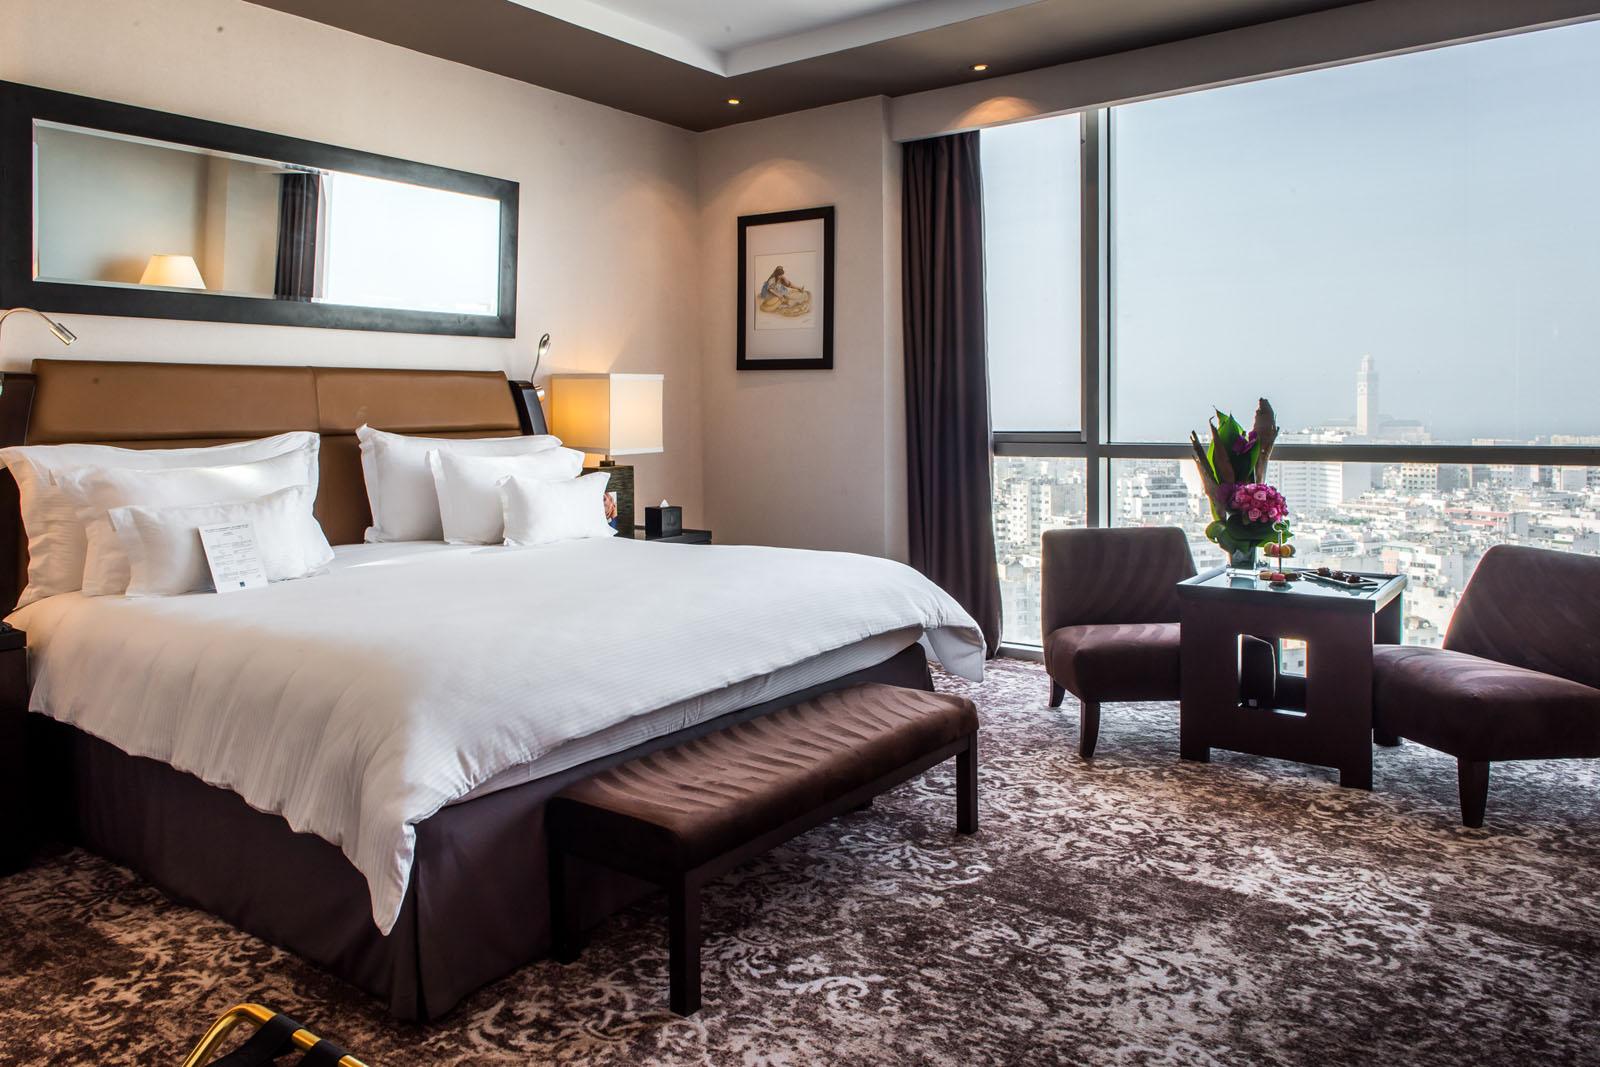 Deluxe Sky Room at Kenzi Tower Hotel in central Casablanca, Moro